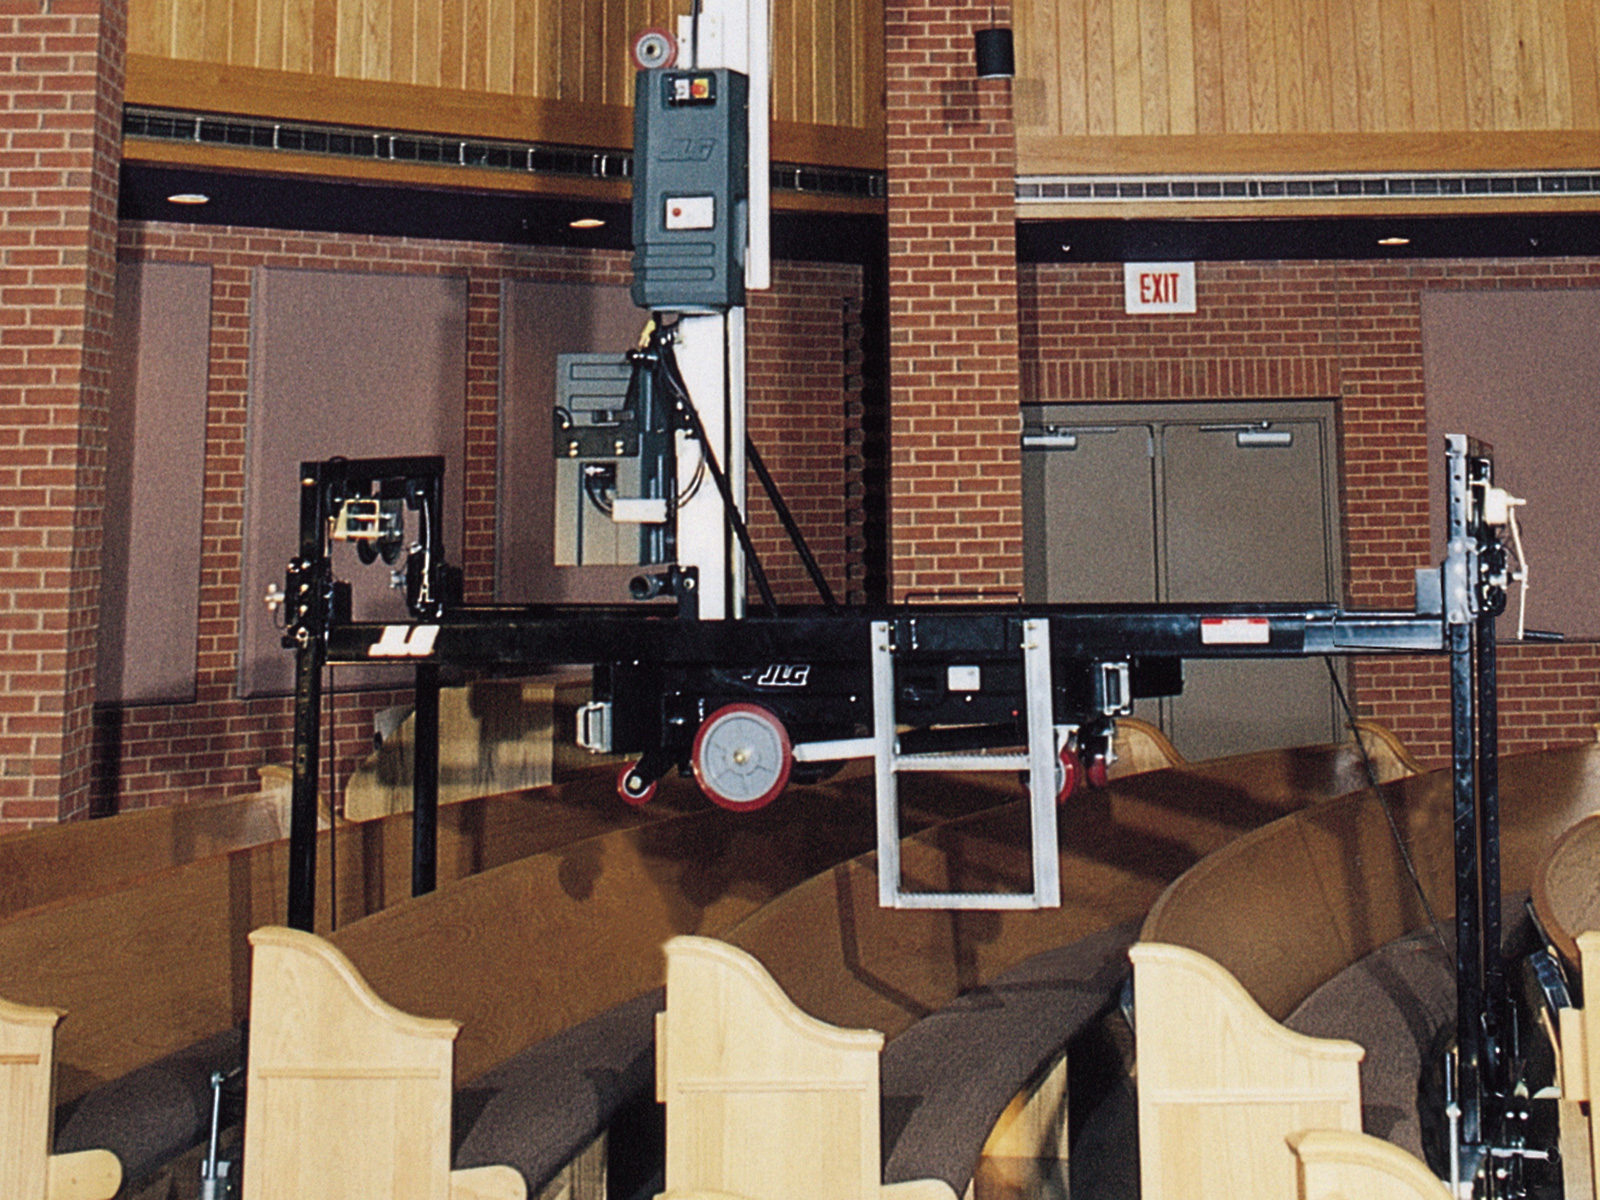 25am Push Around Vertical Mast Lift Jlg Awp 25s Genie Wiring Diagram